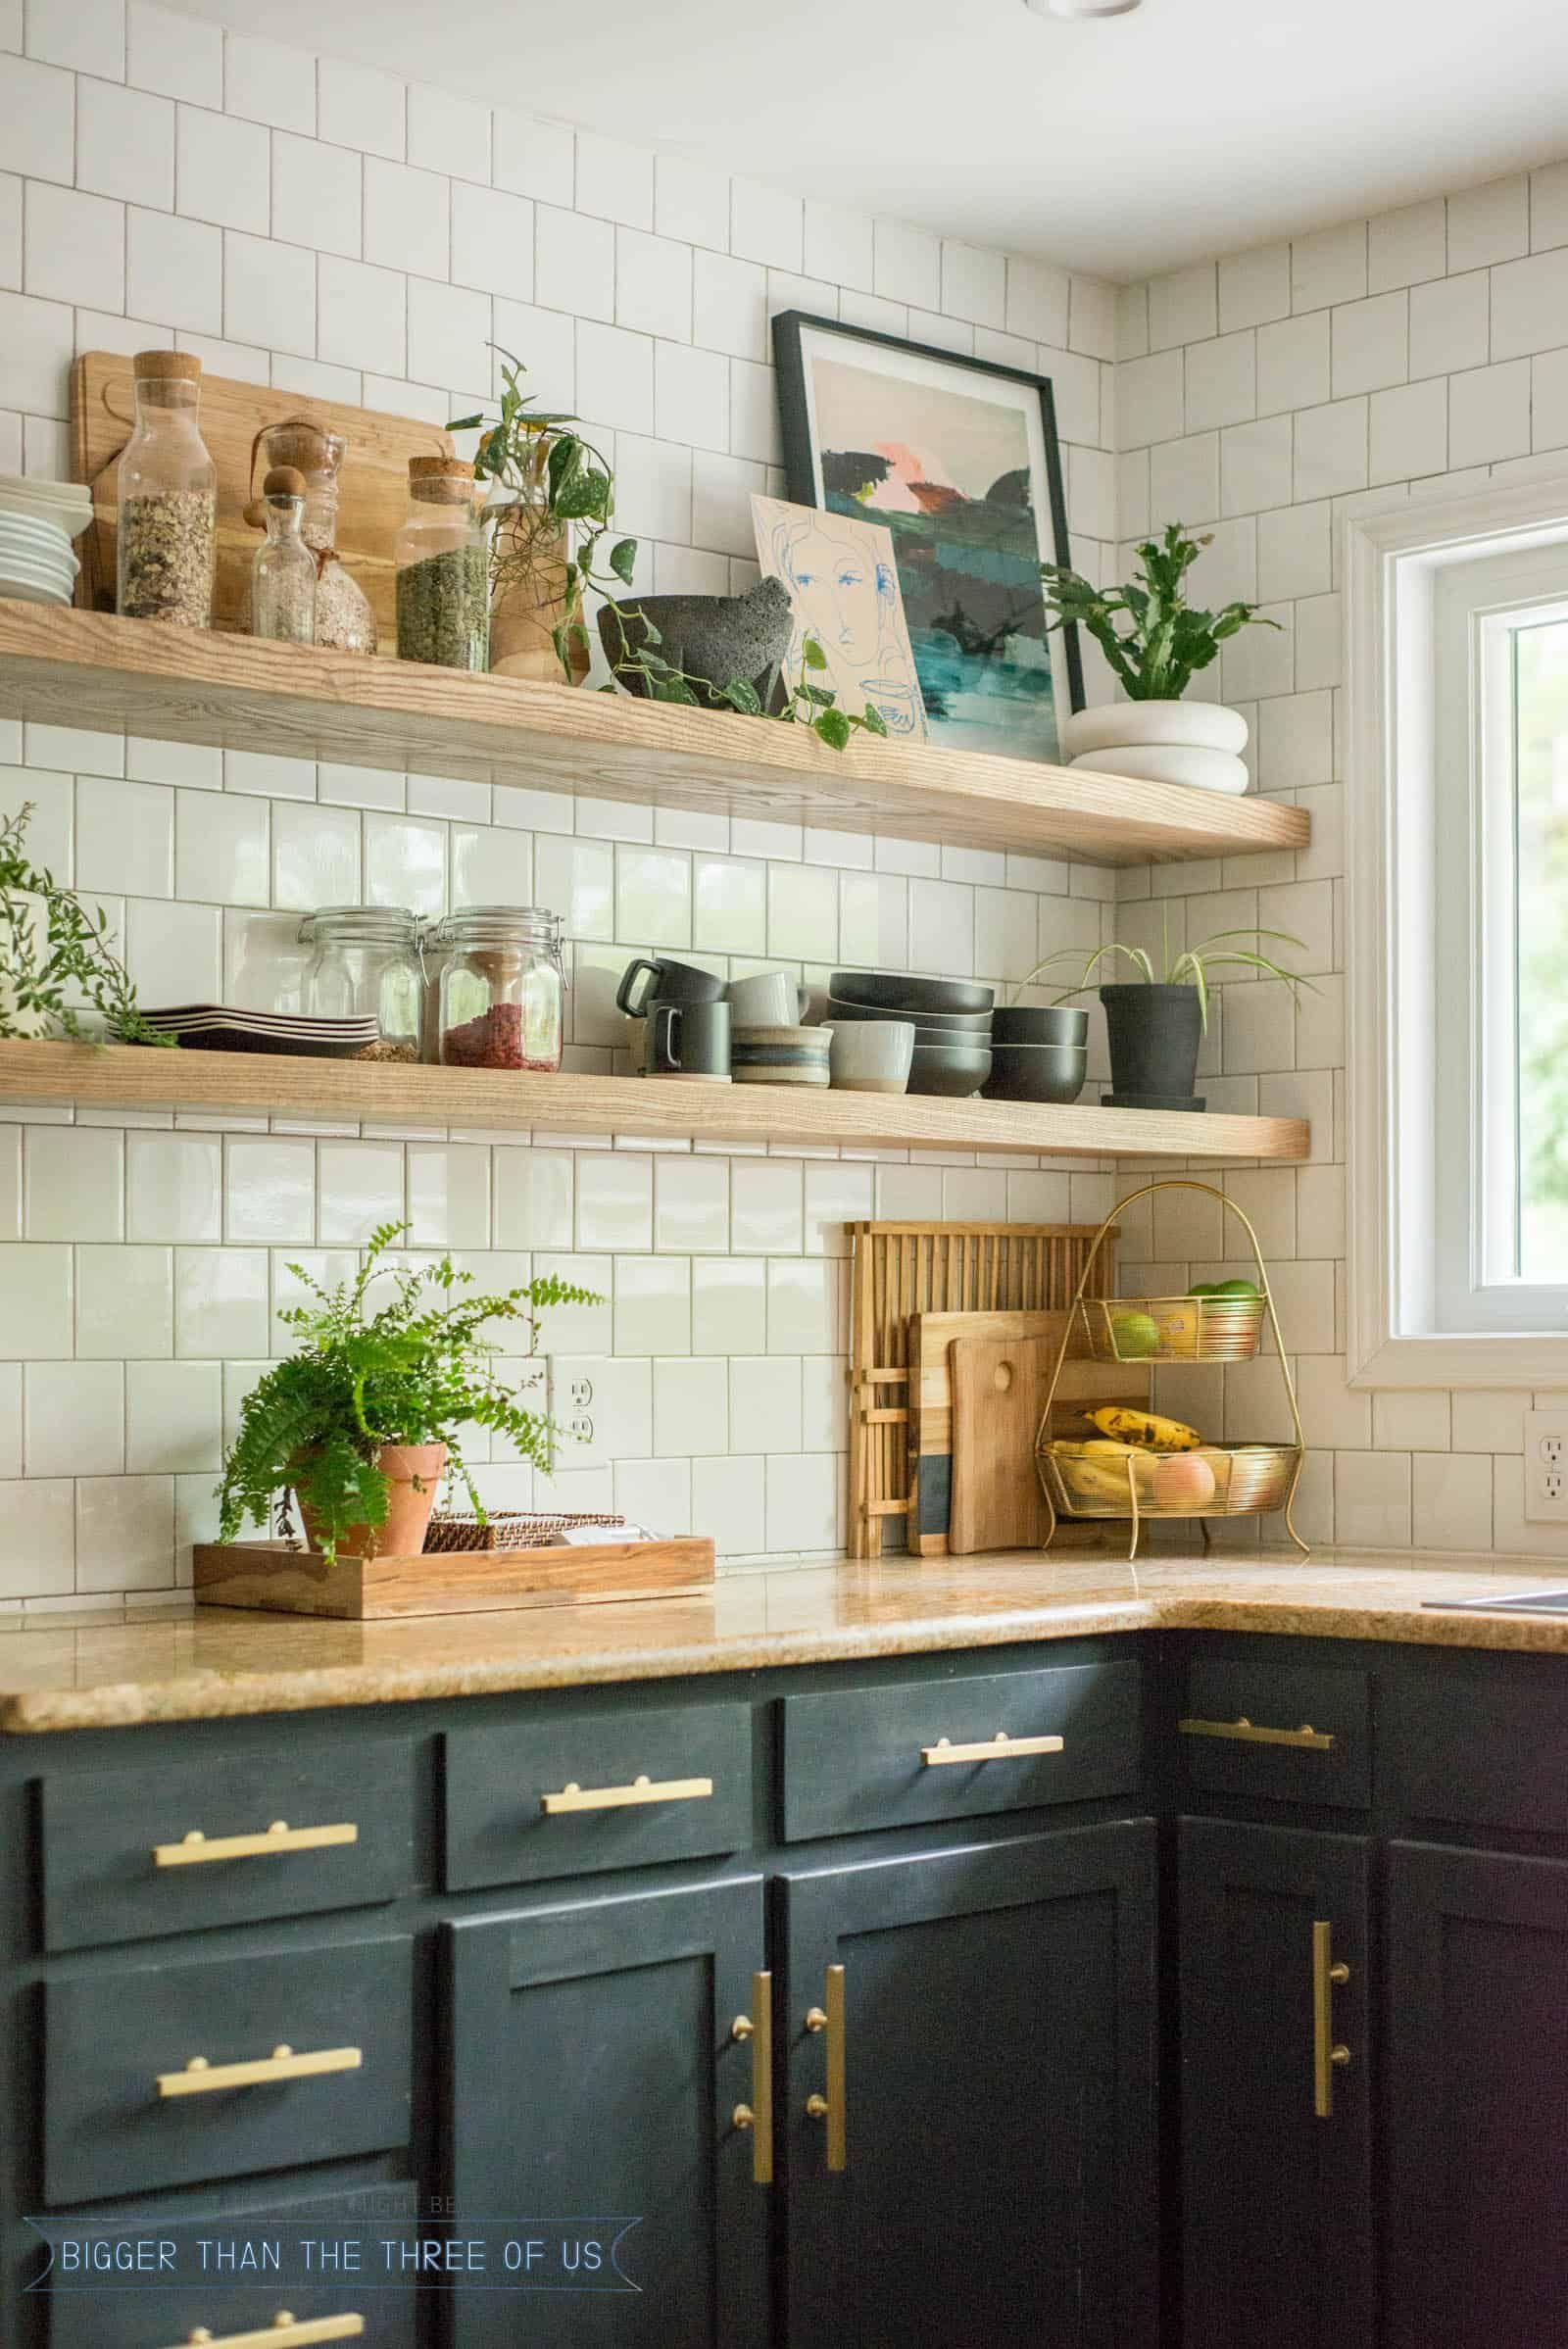 diy open shelving kitchen guide floating shelves kitchen on floating shelves kitchen id=50920